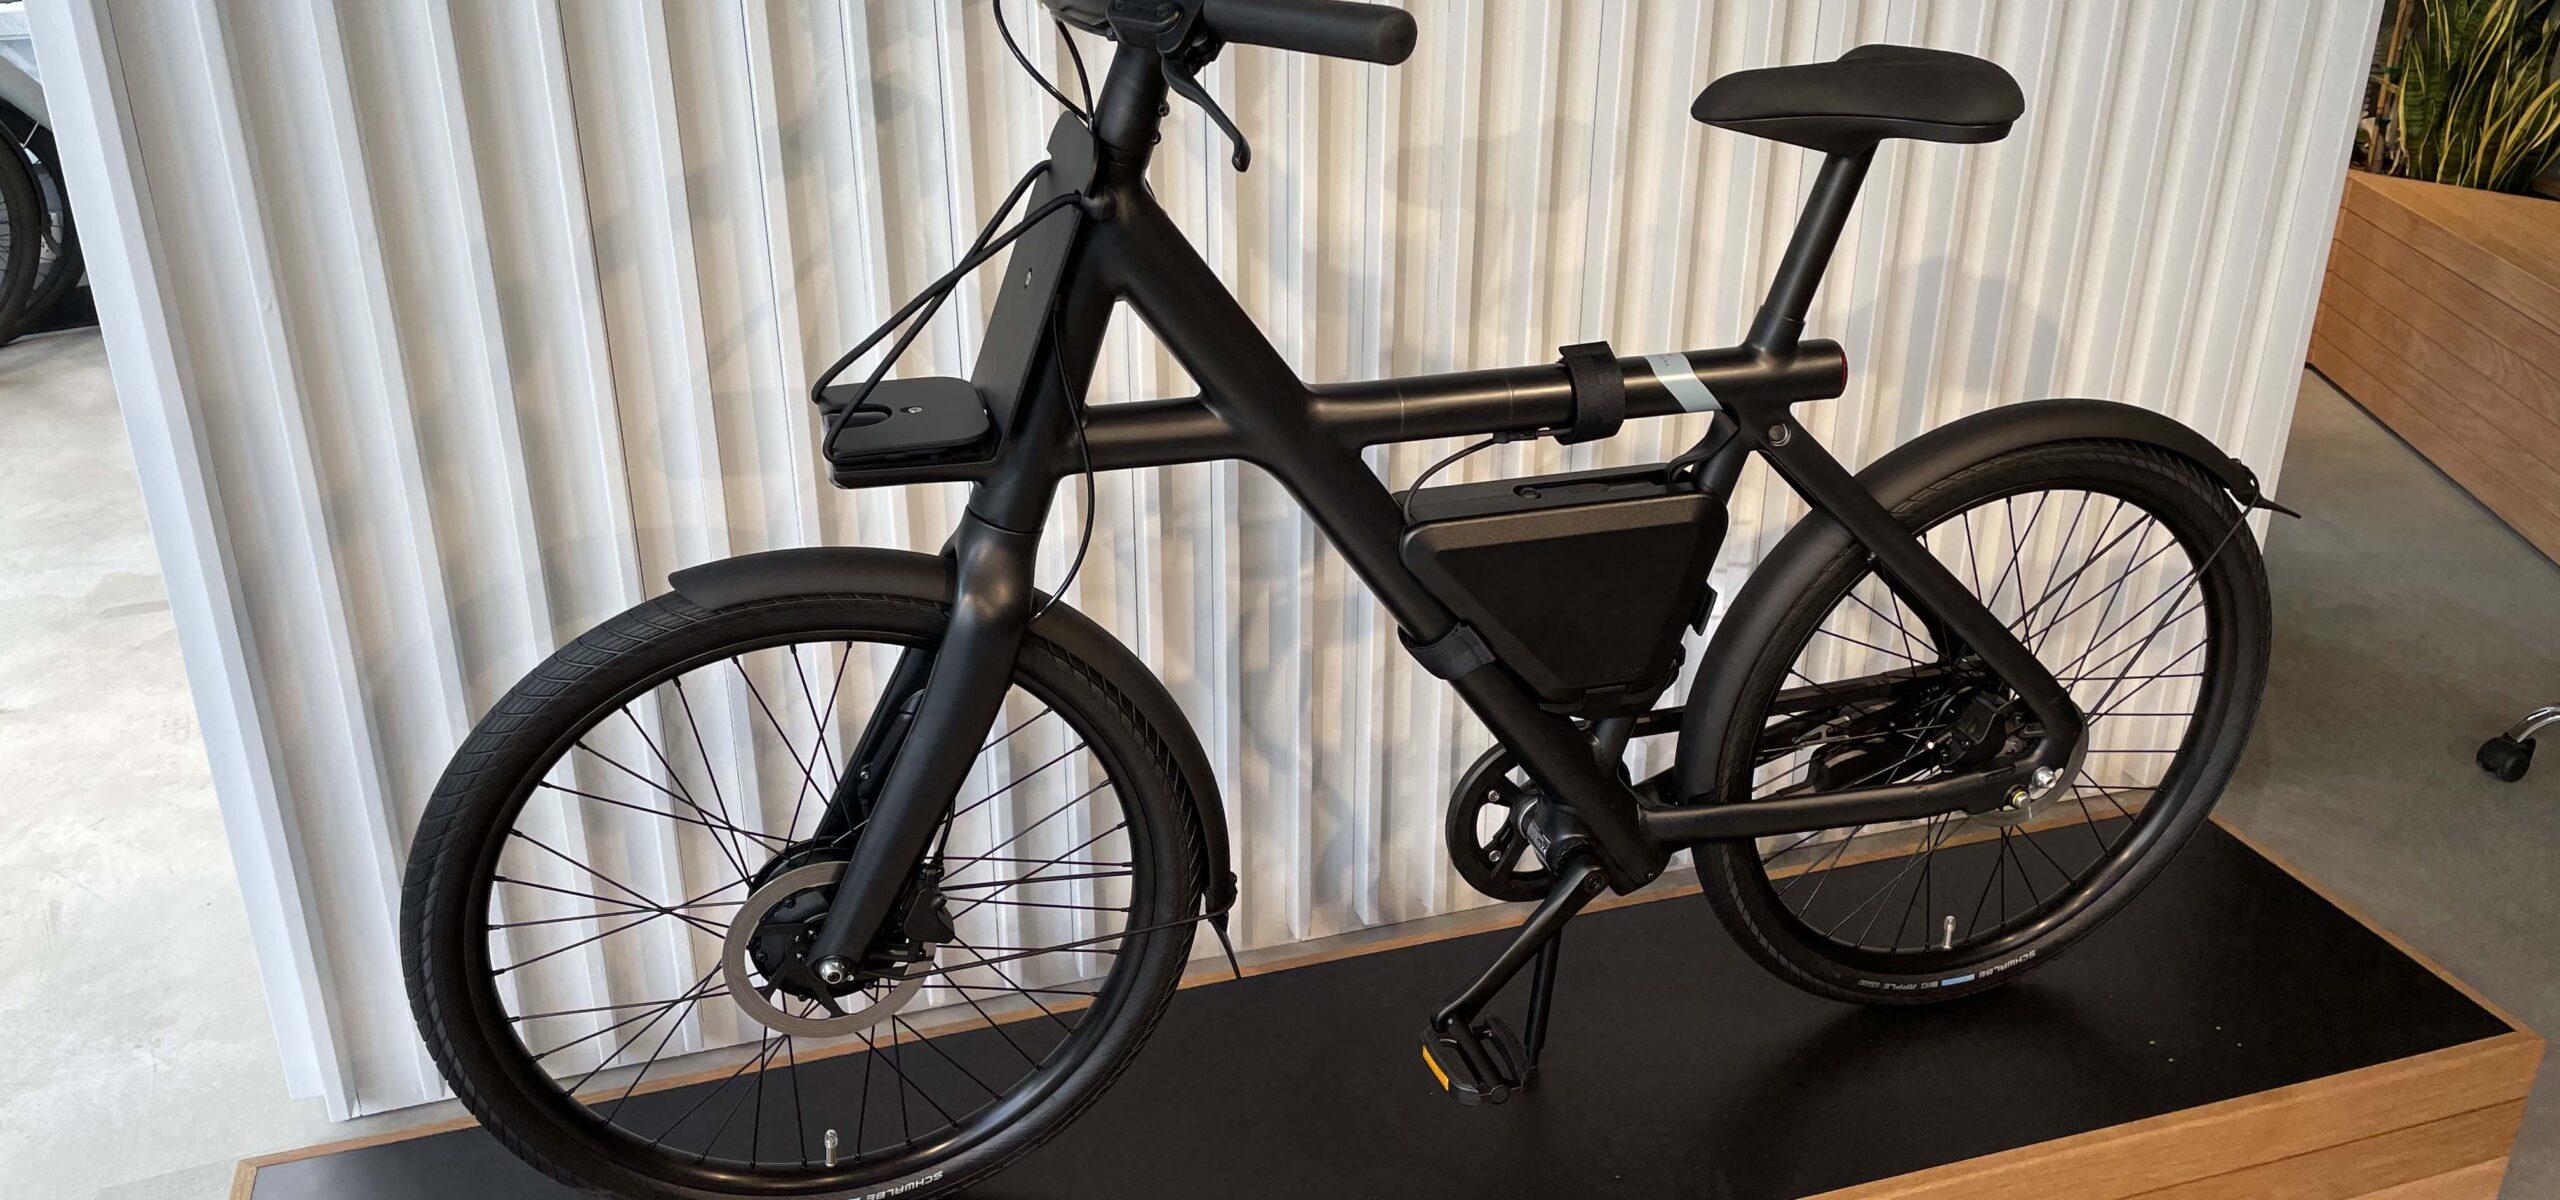 In store display of a black electric bike.